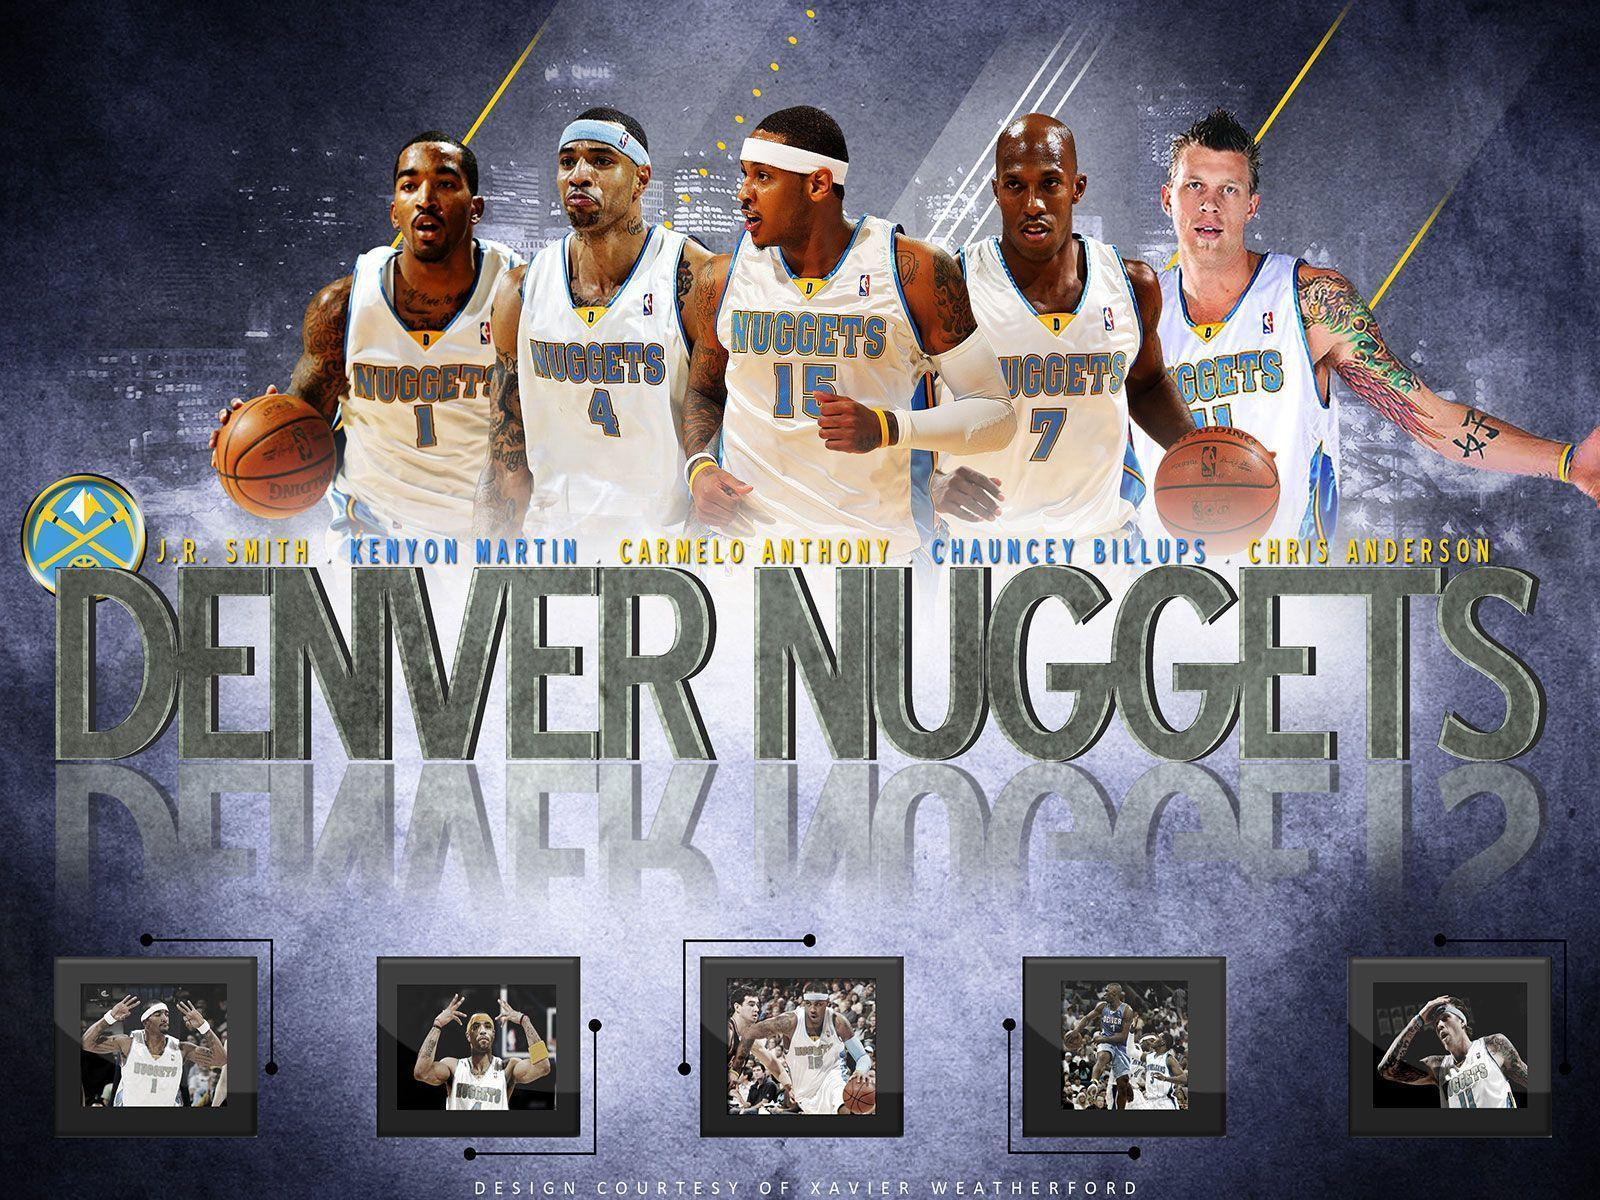 Denver Nuggets 2010 Team Wallpaper | Basketball Wallpapers at ...